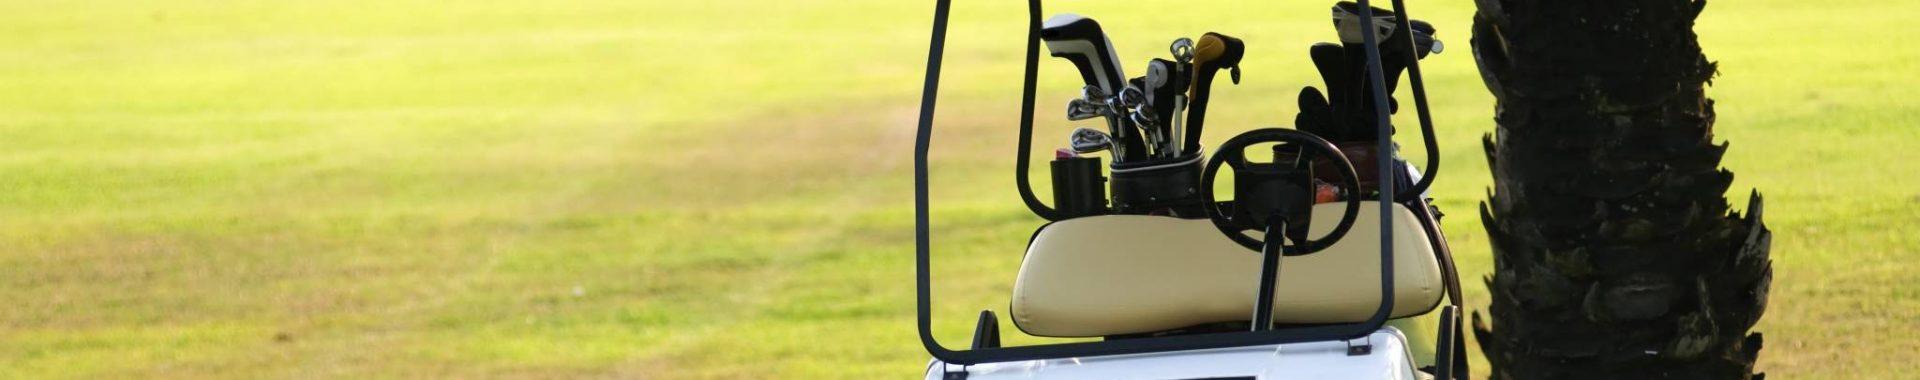 Sentry Longest Golf Cart Batteries